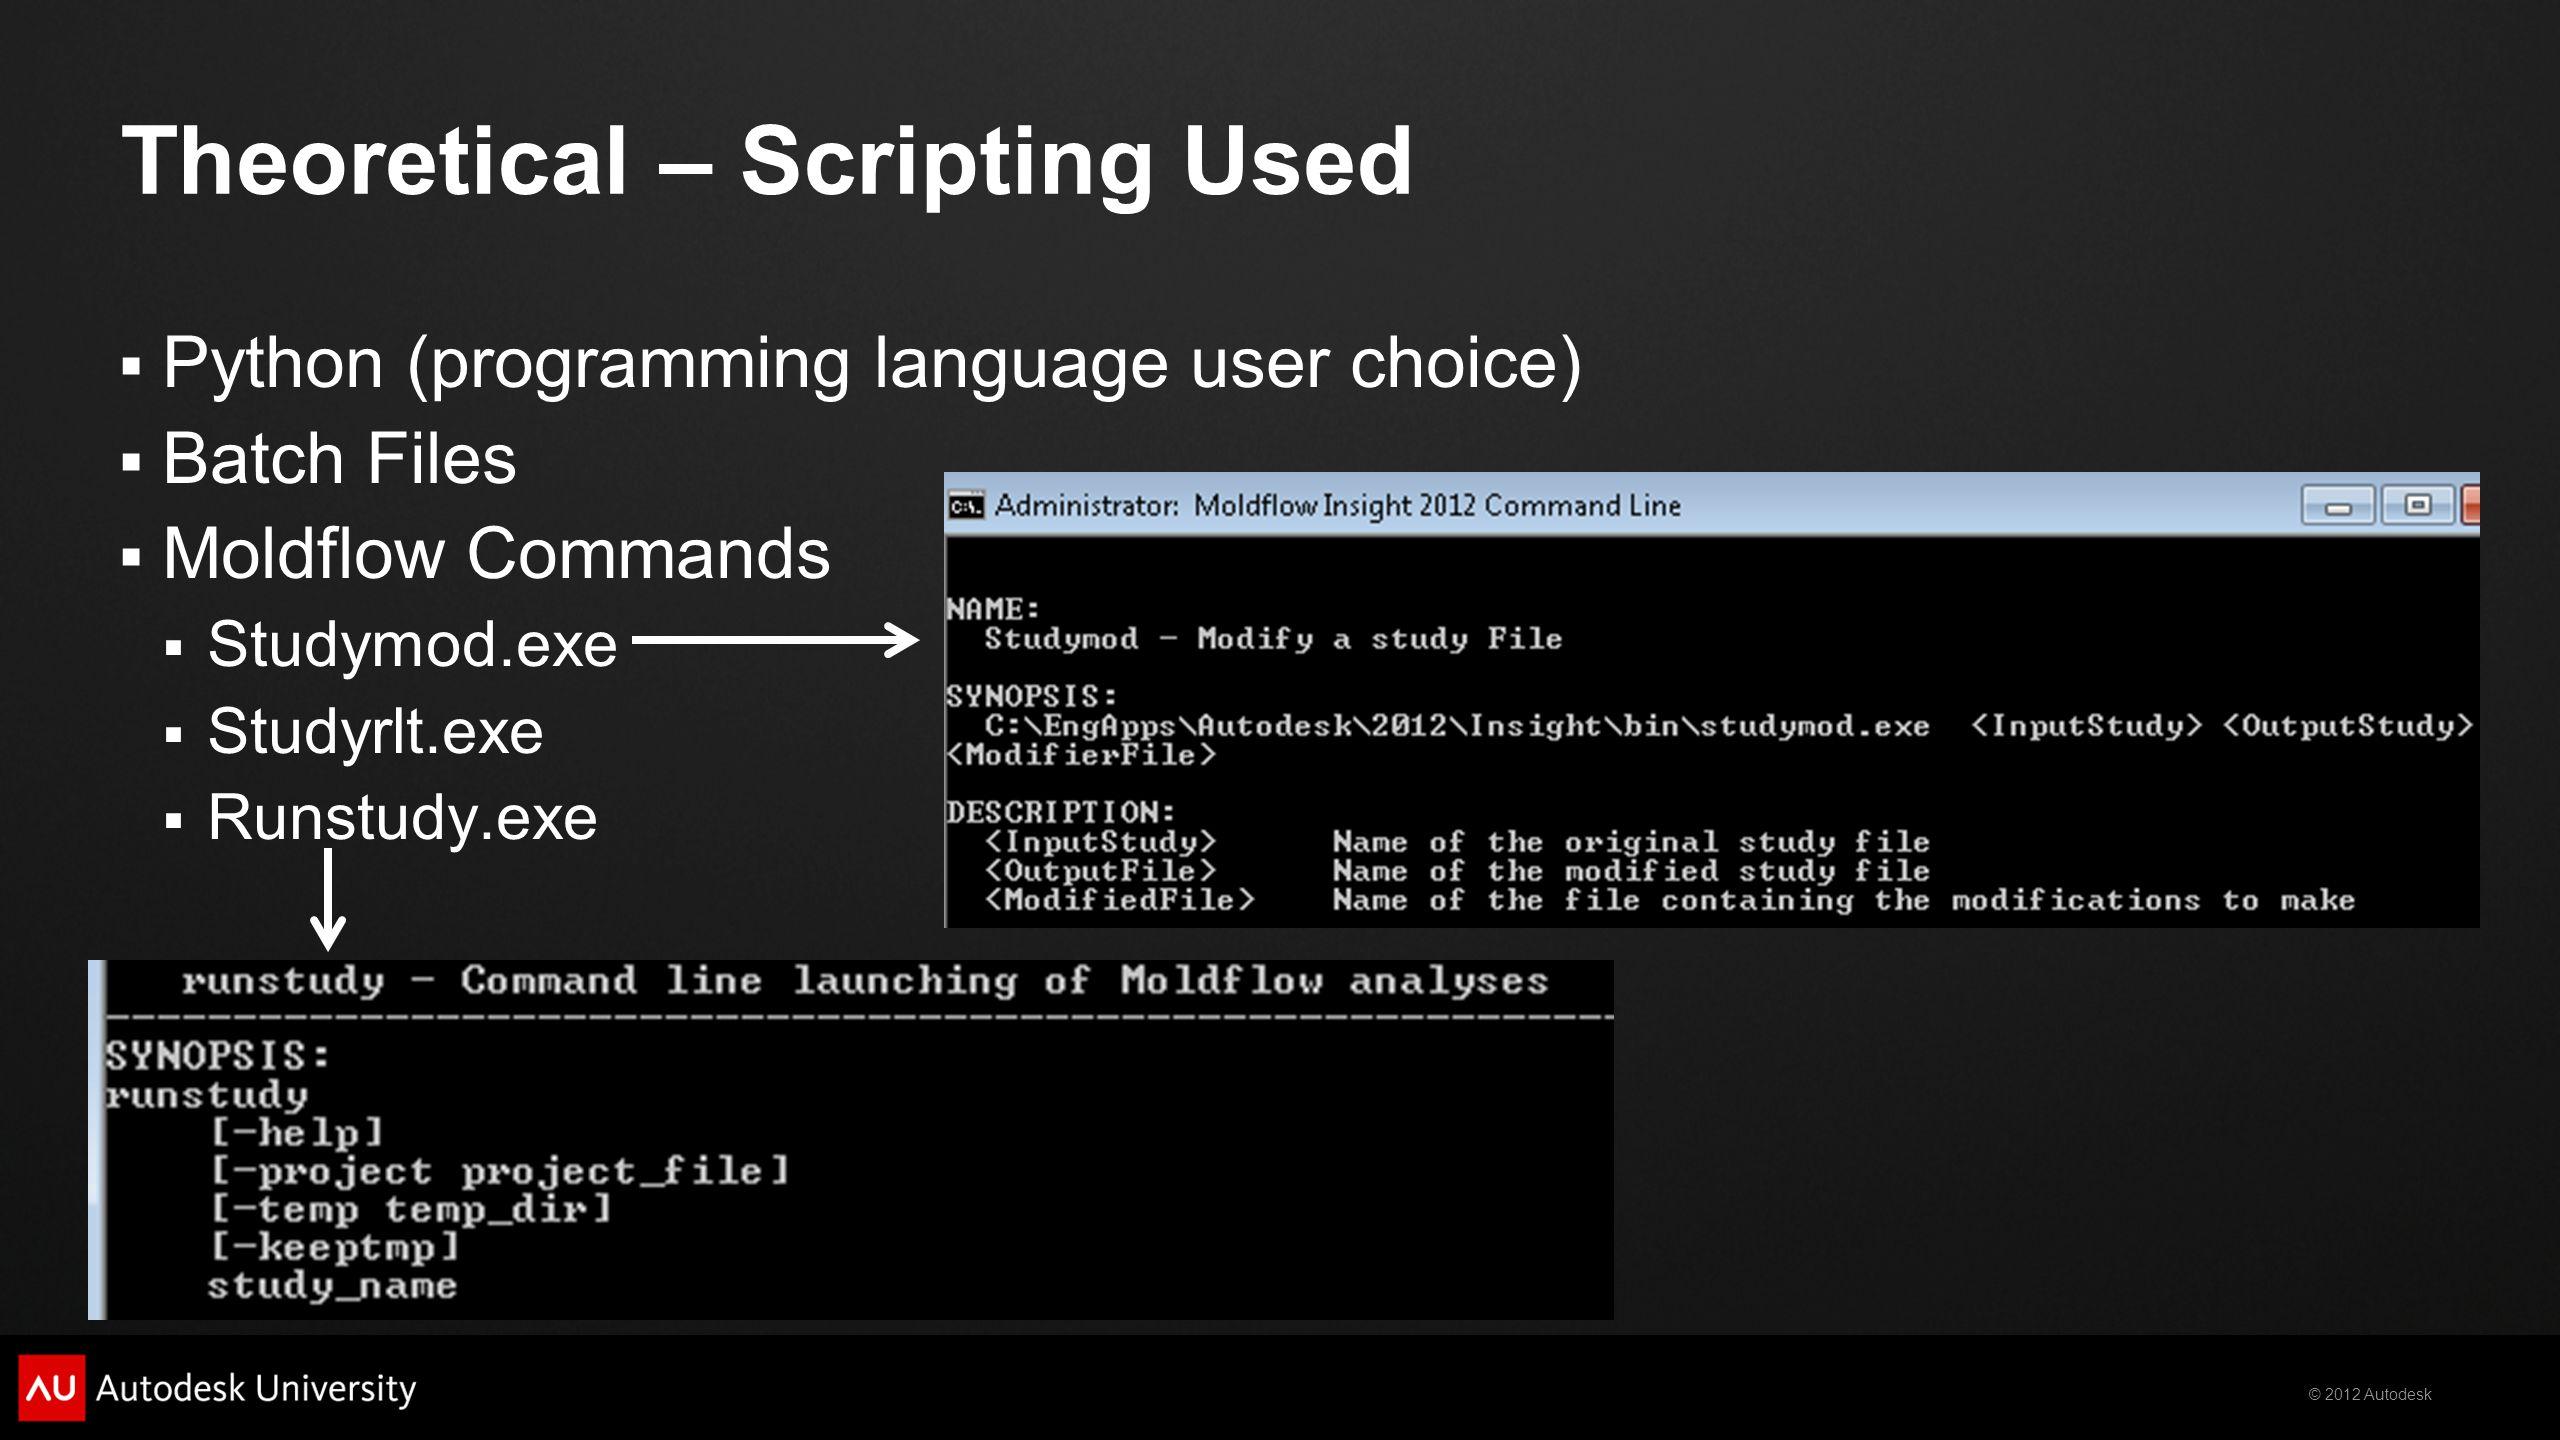 © 2012 Autodesk  Python (programming language user choice)  Batch Files  Moldflow Commands  Studymod.exe  Studyrlt.exe  Runstudy.exe Theoretical